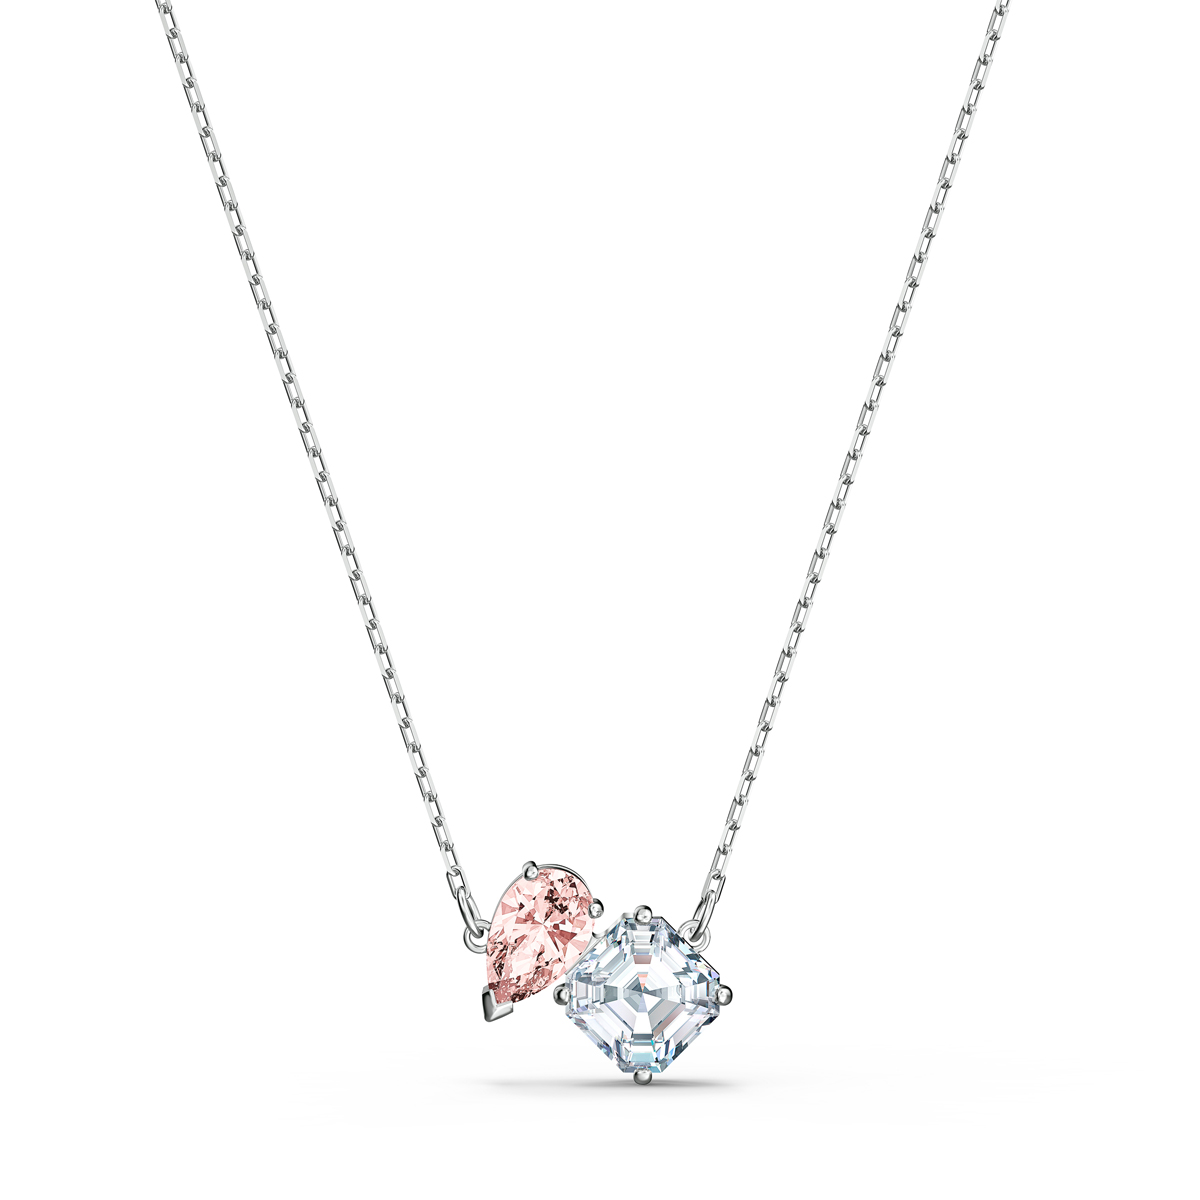 Swarovski Necklace Attract Soul Necklace Pink Crystal Rhodium Silver